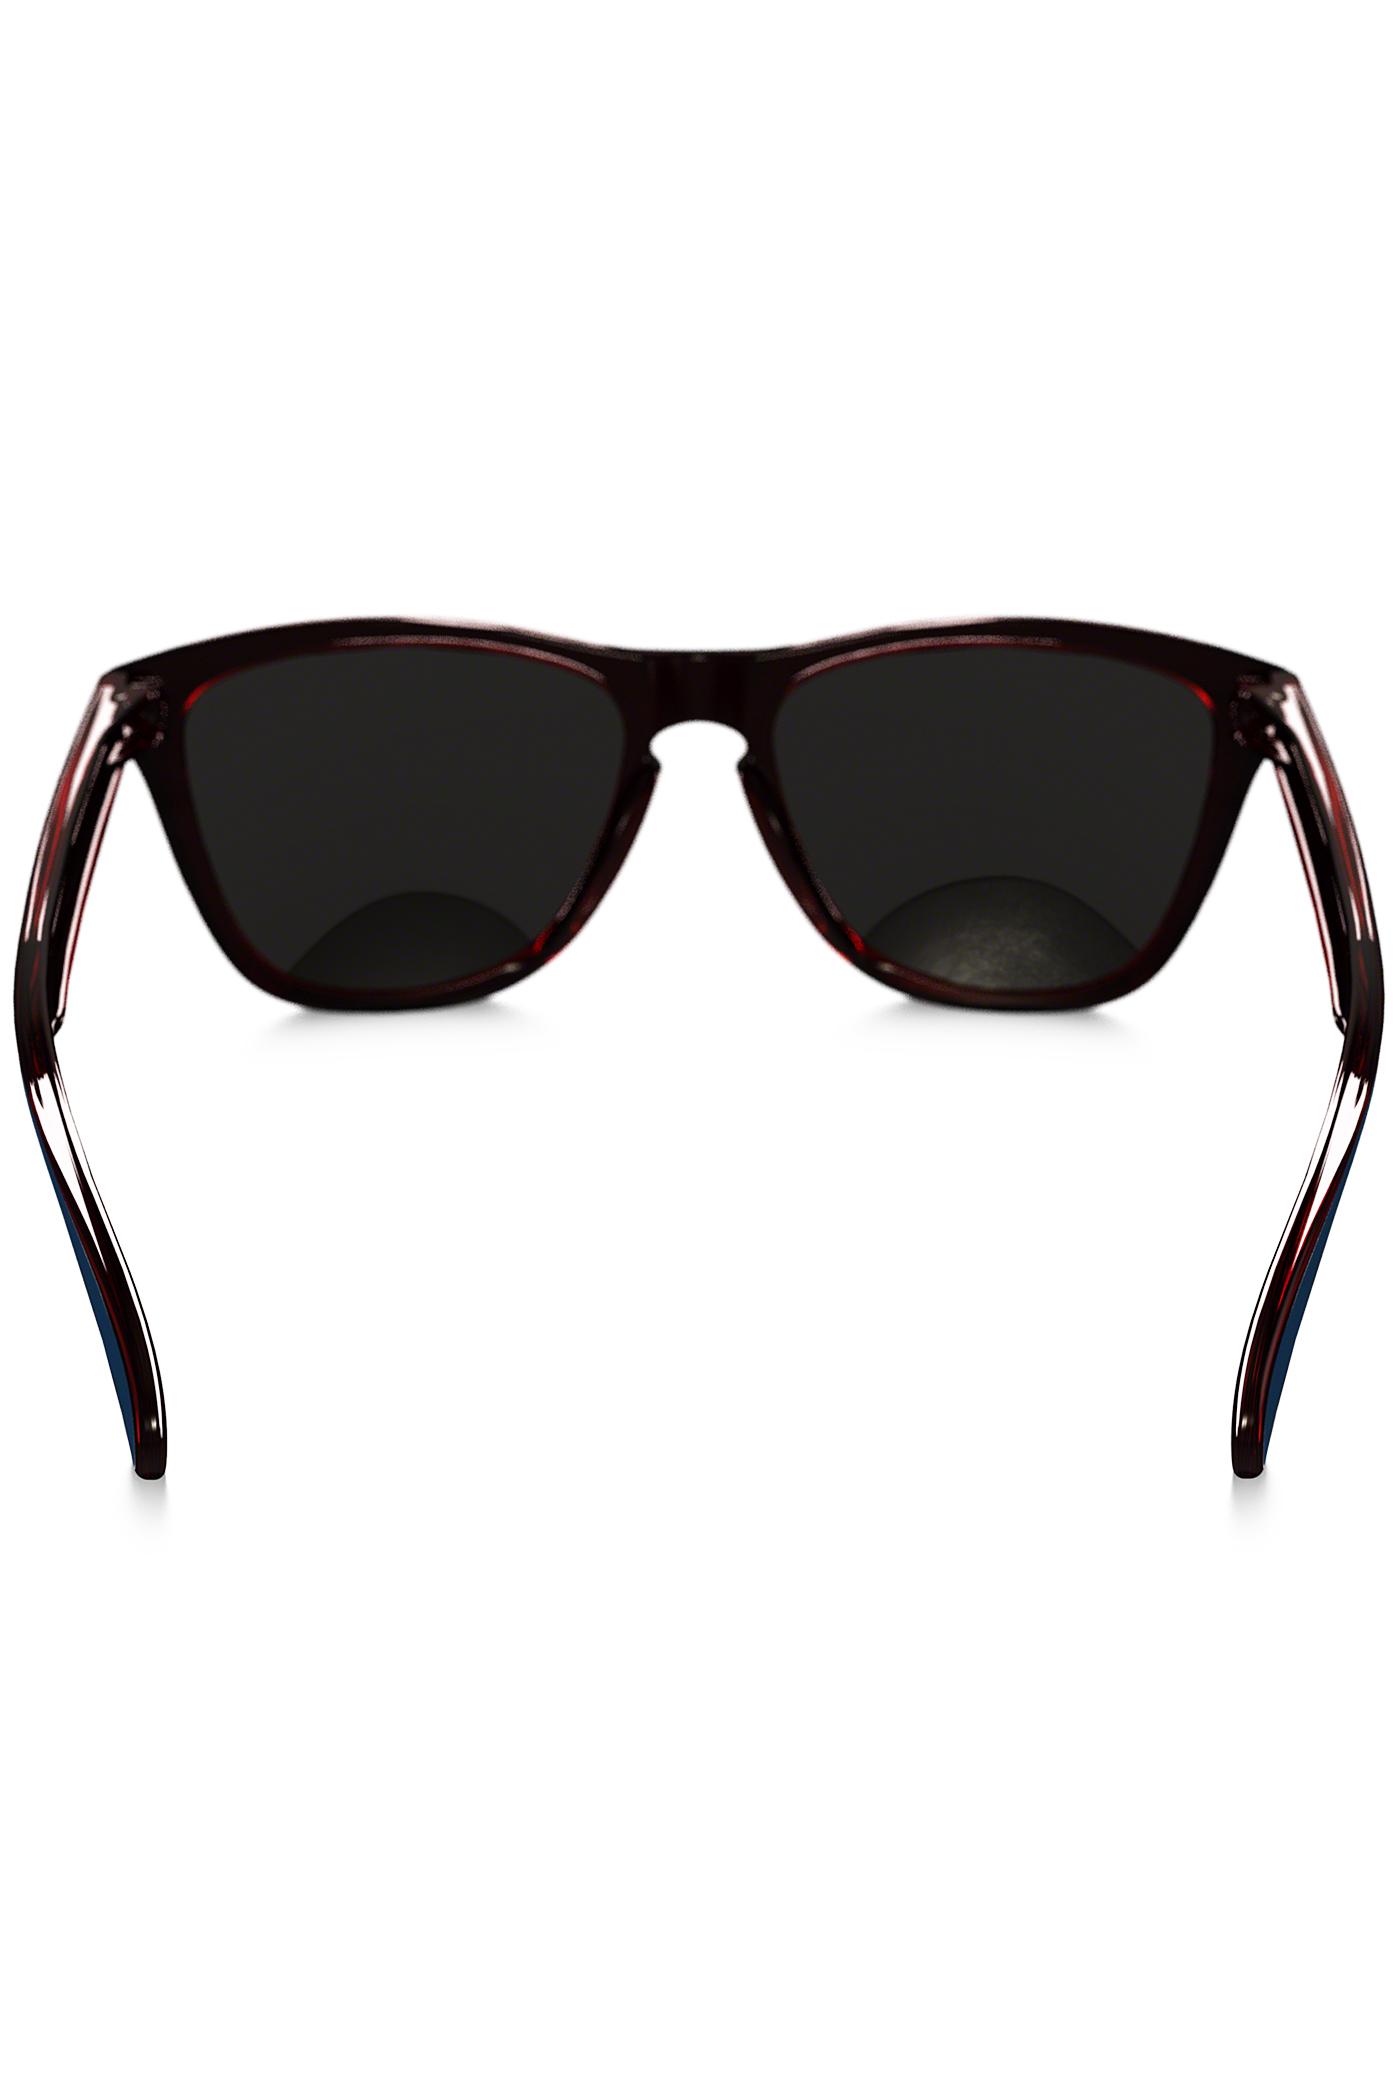 6920a0392e Buy Oakley Frogskin Sunglasses « Heritage Malta